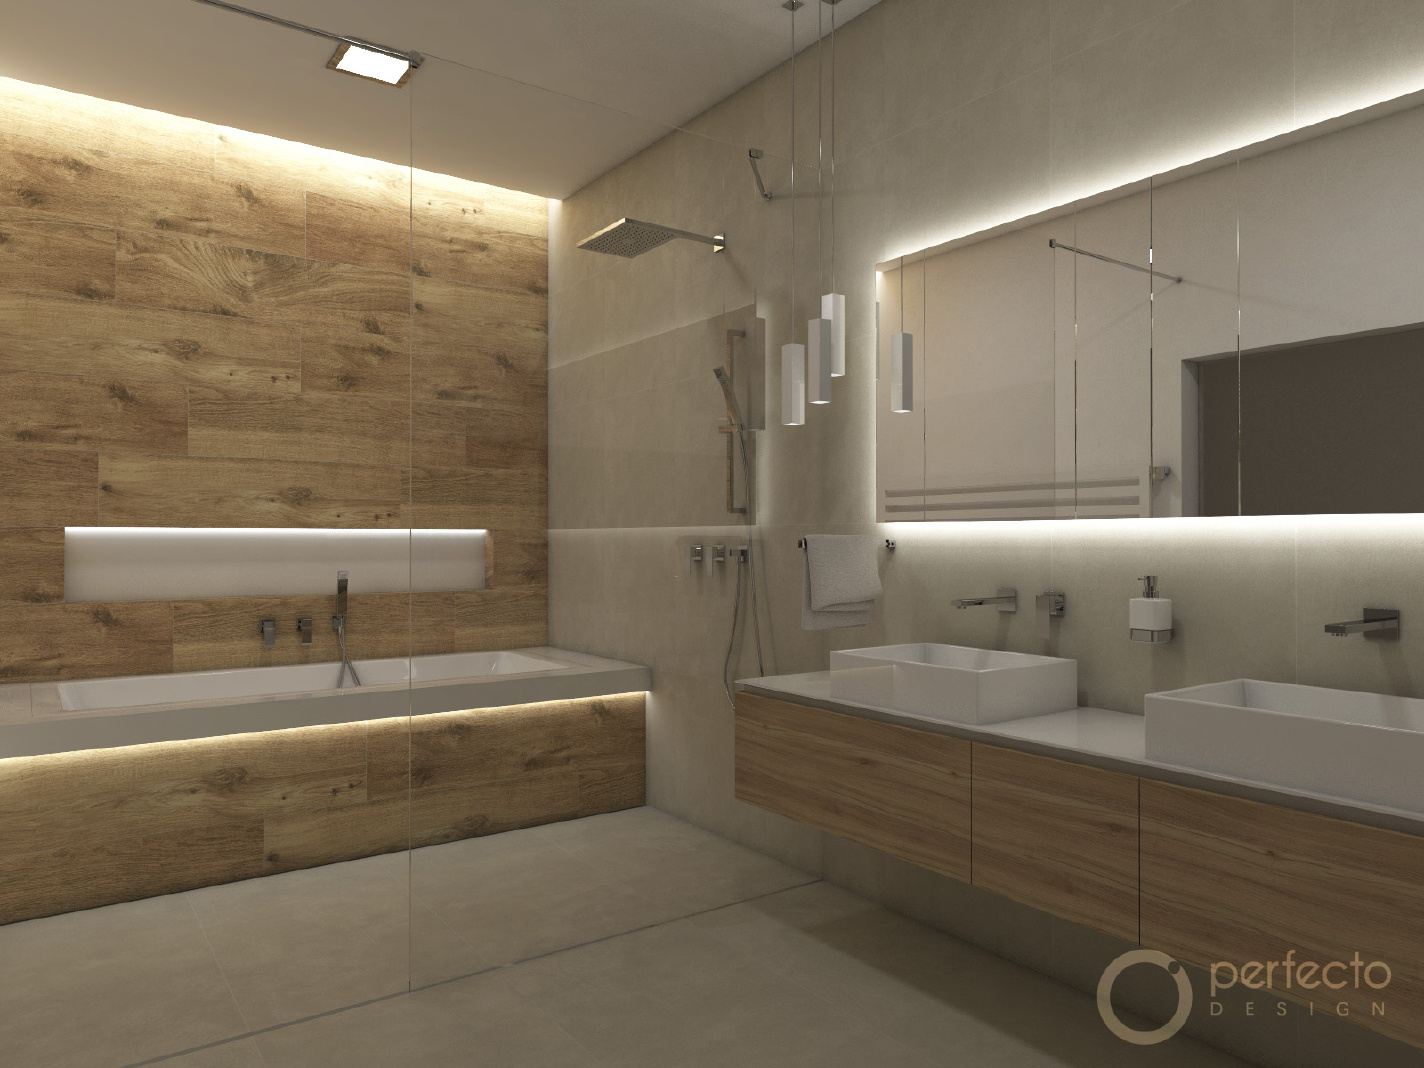 Modernes Badezimmer SAND  Perfecto design